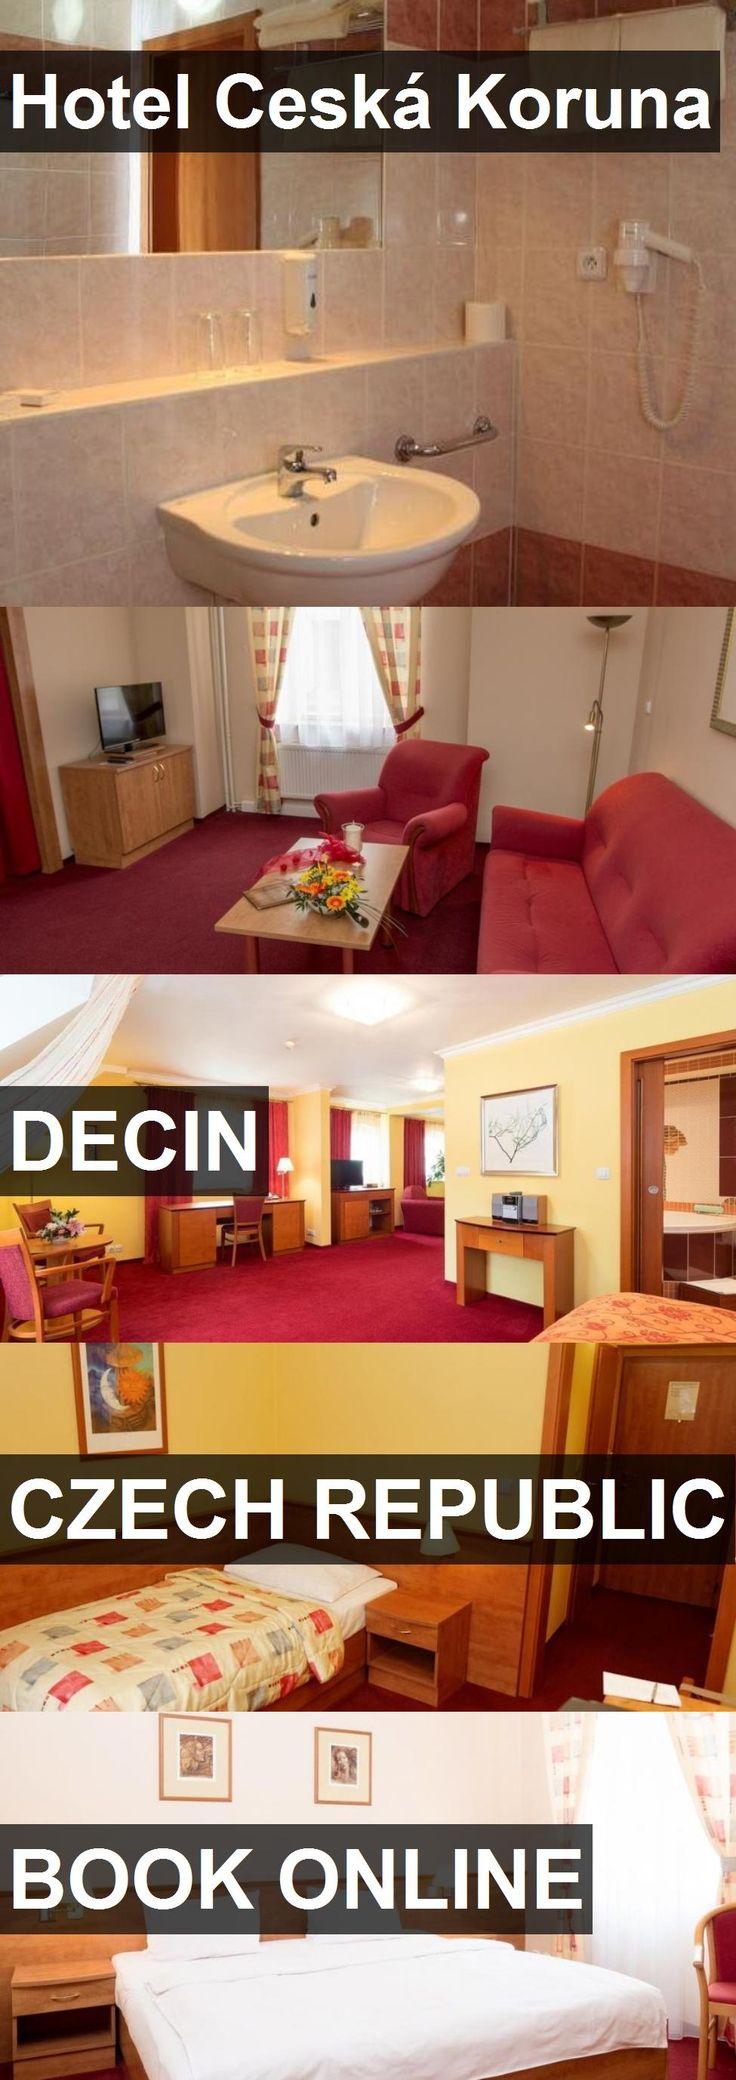 Hotel Ceská Koruna in Decin, Czech Republic. For more information, photos, reviews and best prices please follow the link. #CzechRepublic #Decin #travel #vacation #hotel